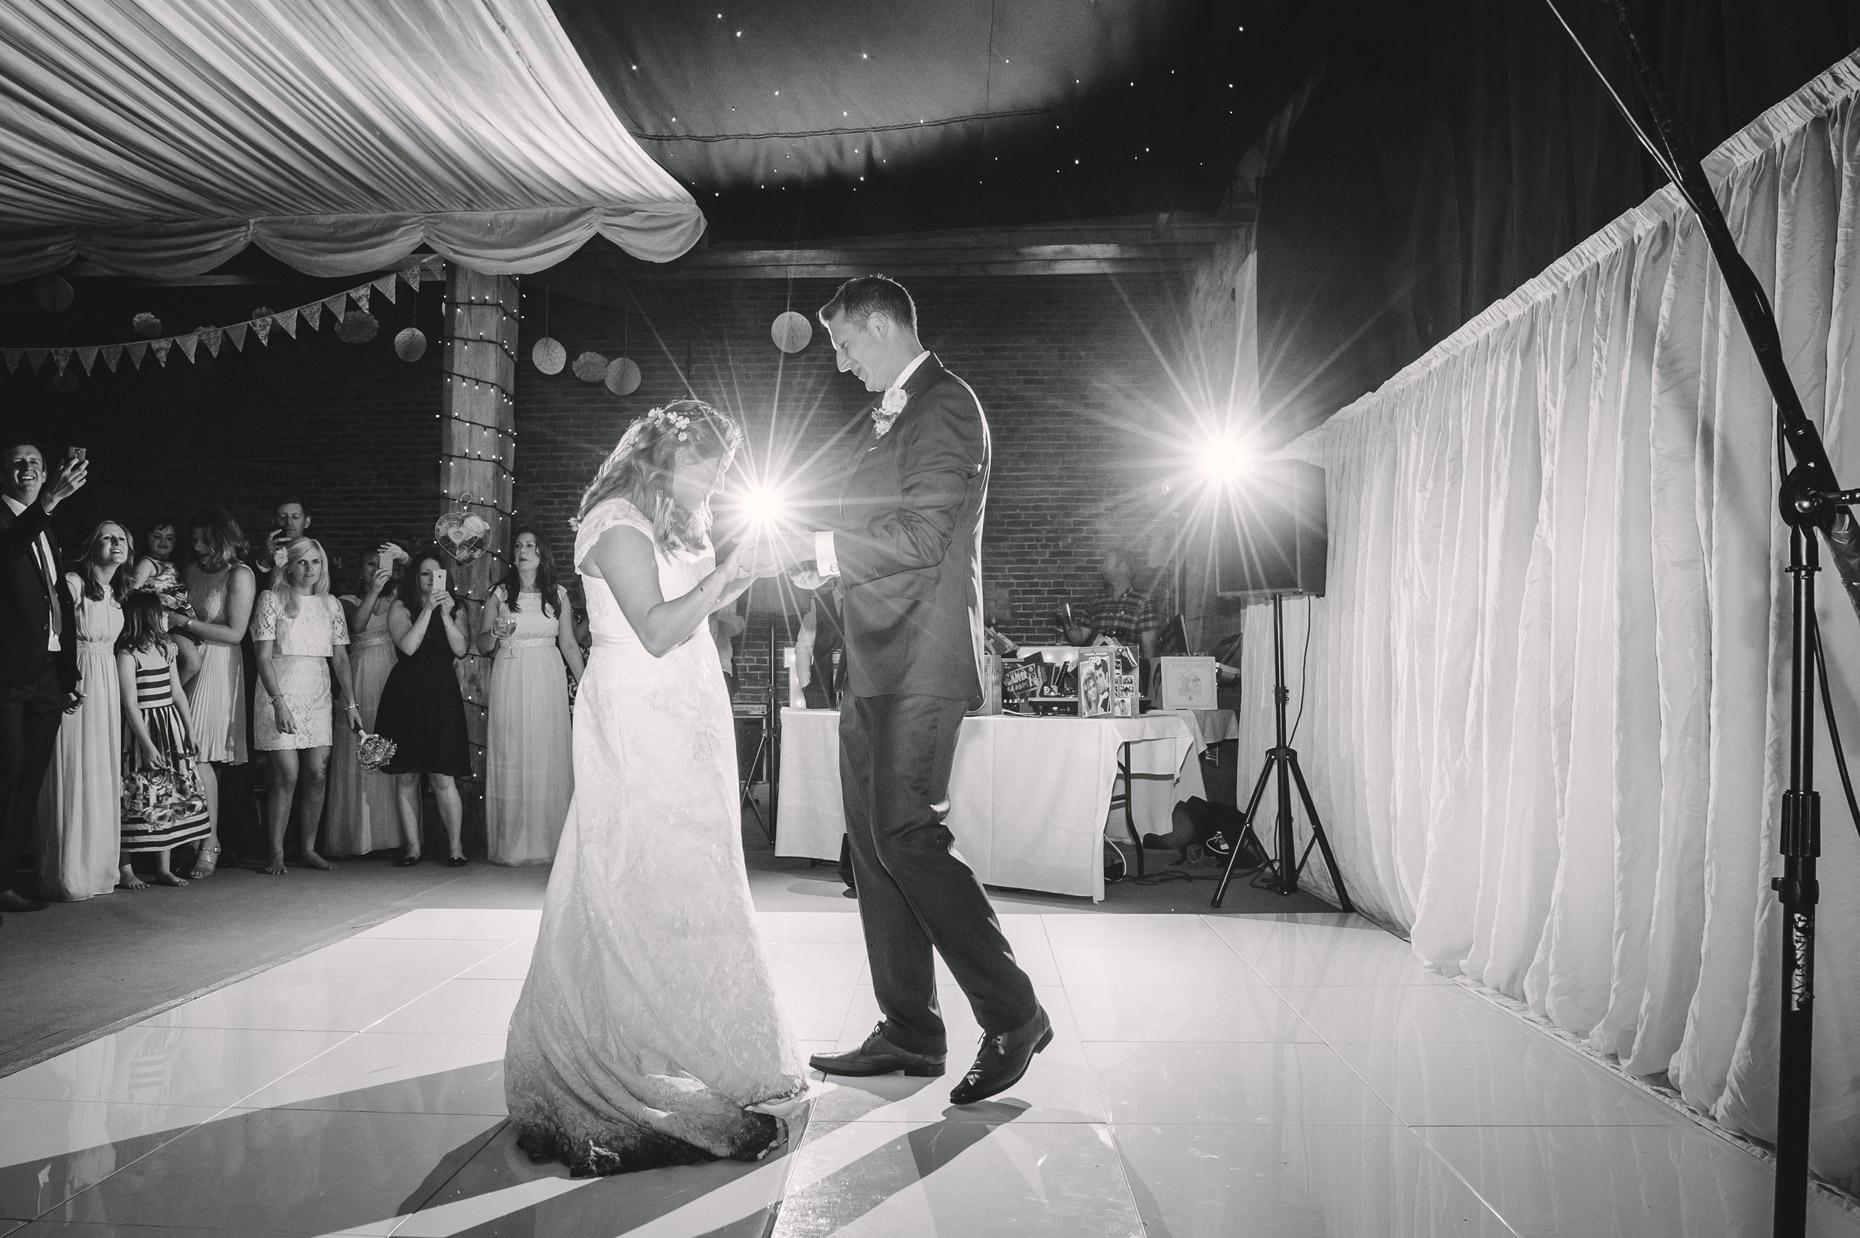 barmbyfield_barn_wedding_photos234.jpg